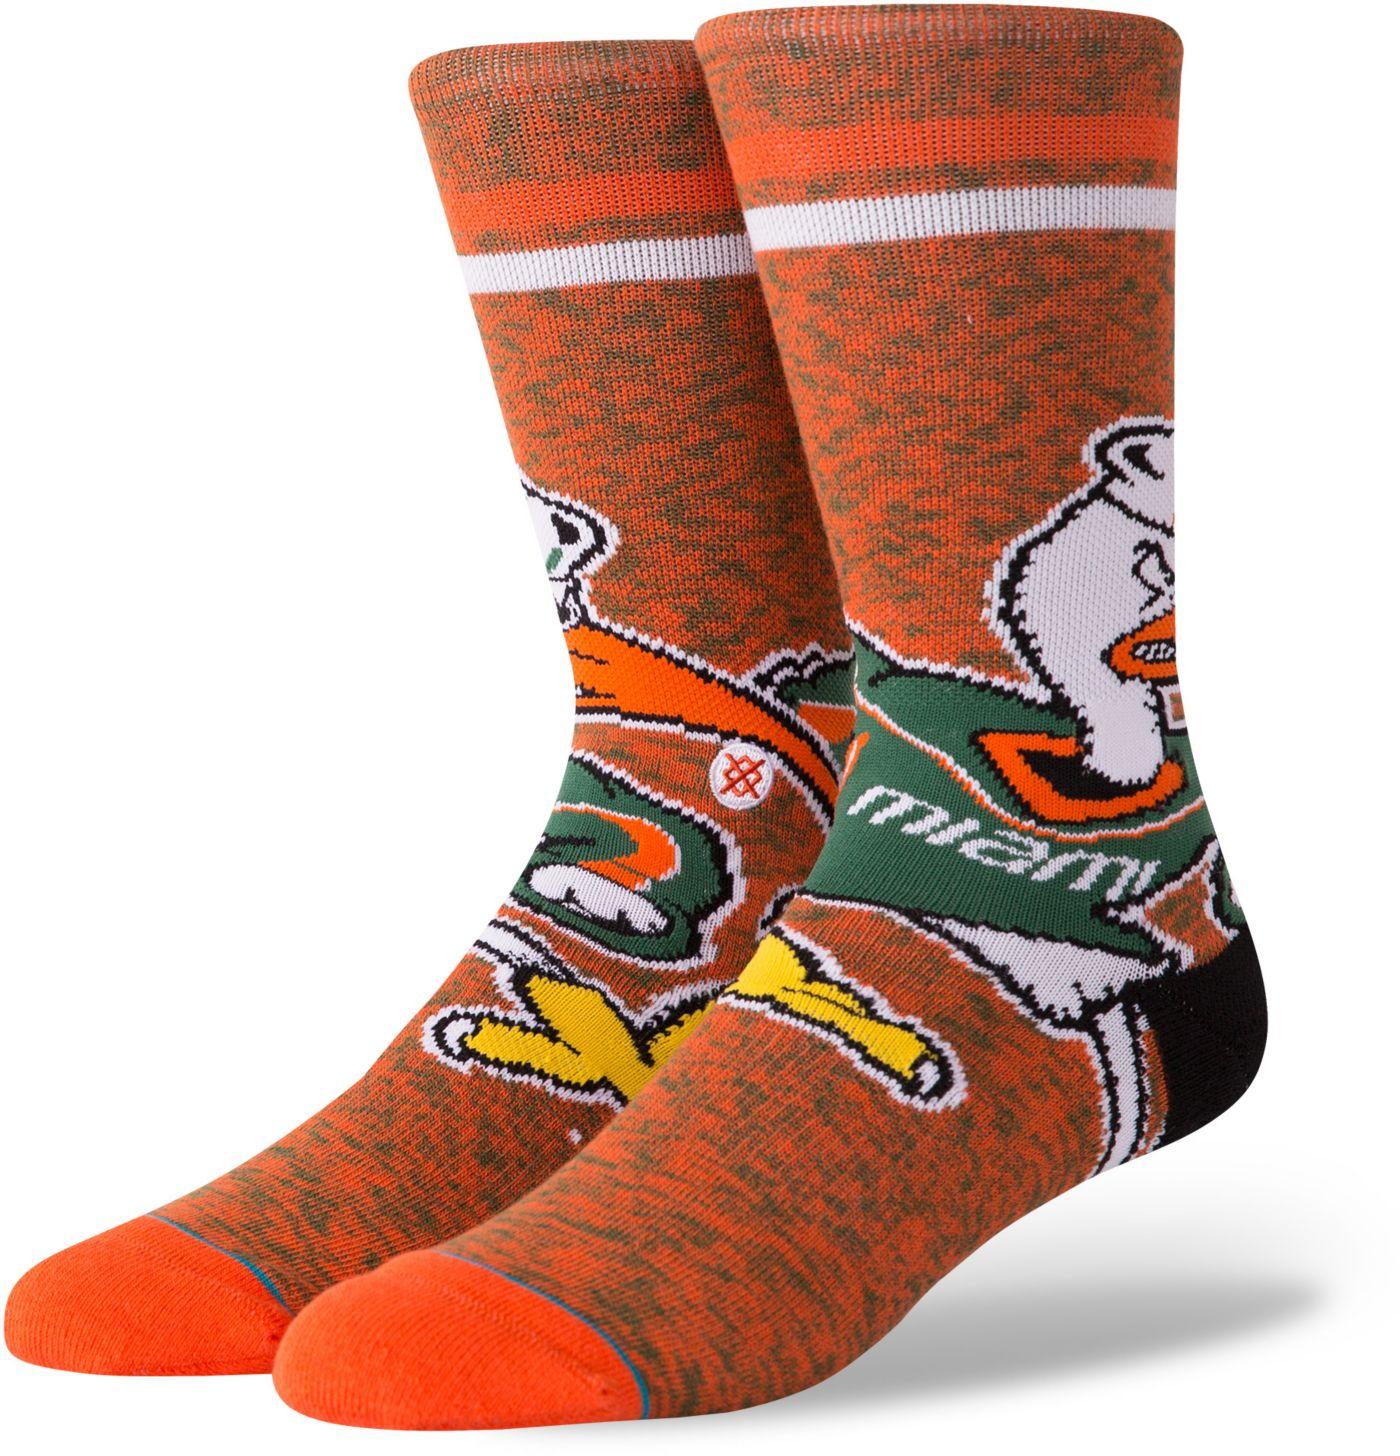 Stance Men's Miami Hurricanes Character Crew Socks